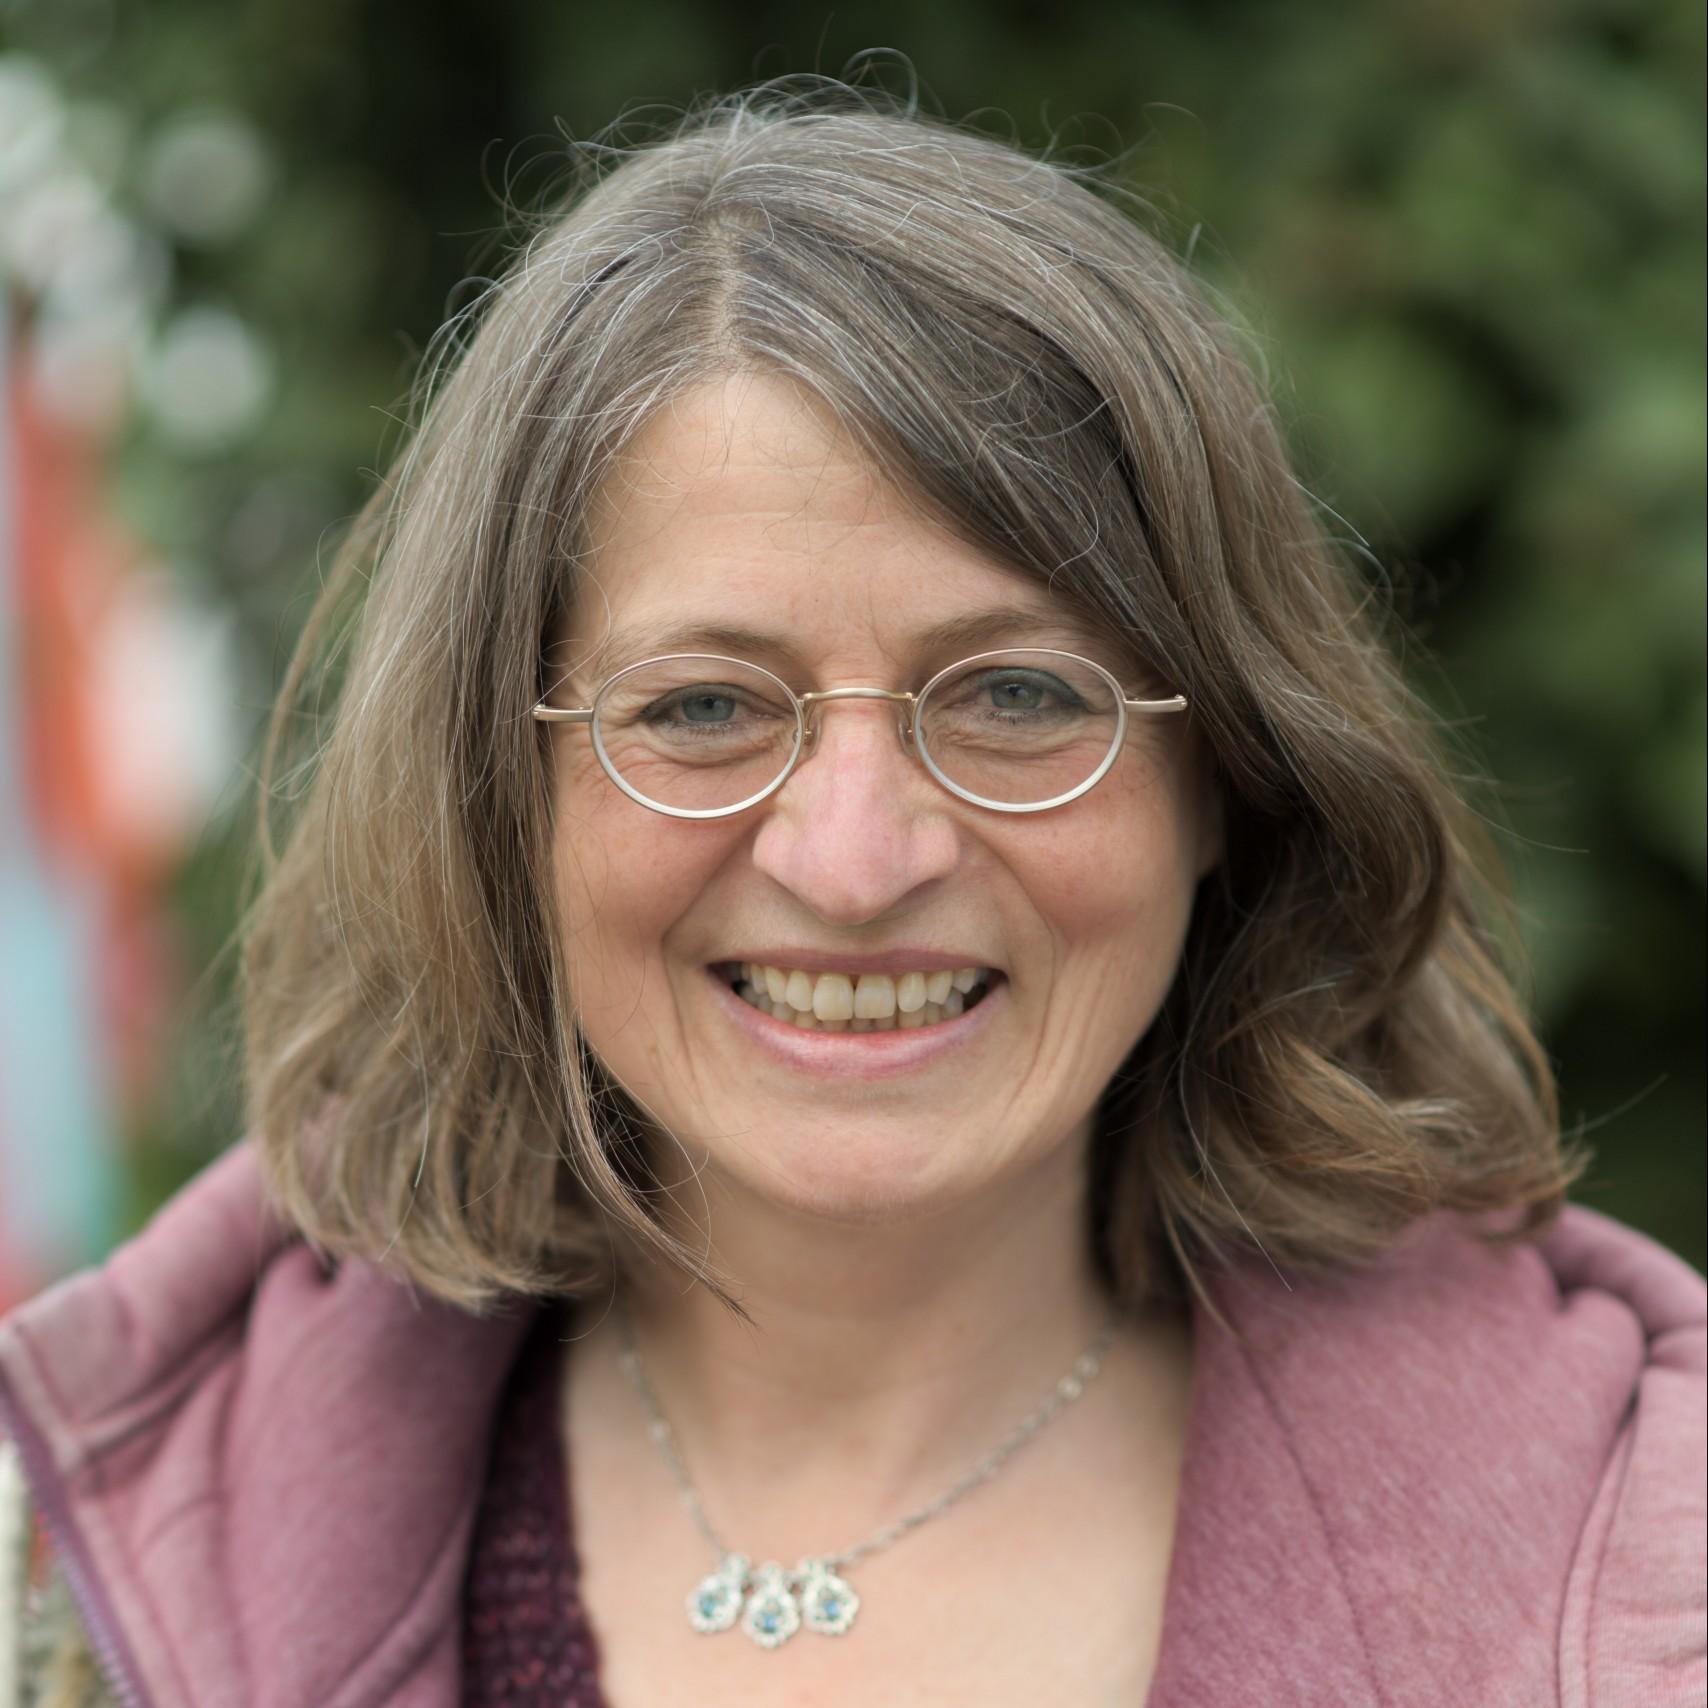 Brigitte Kallmann